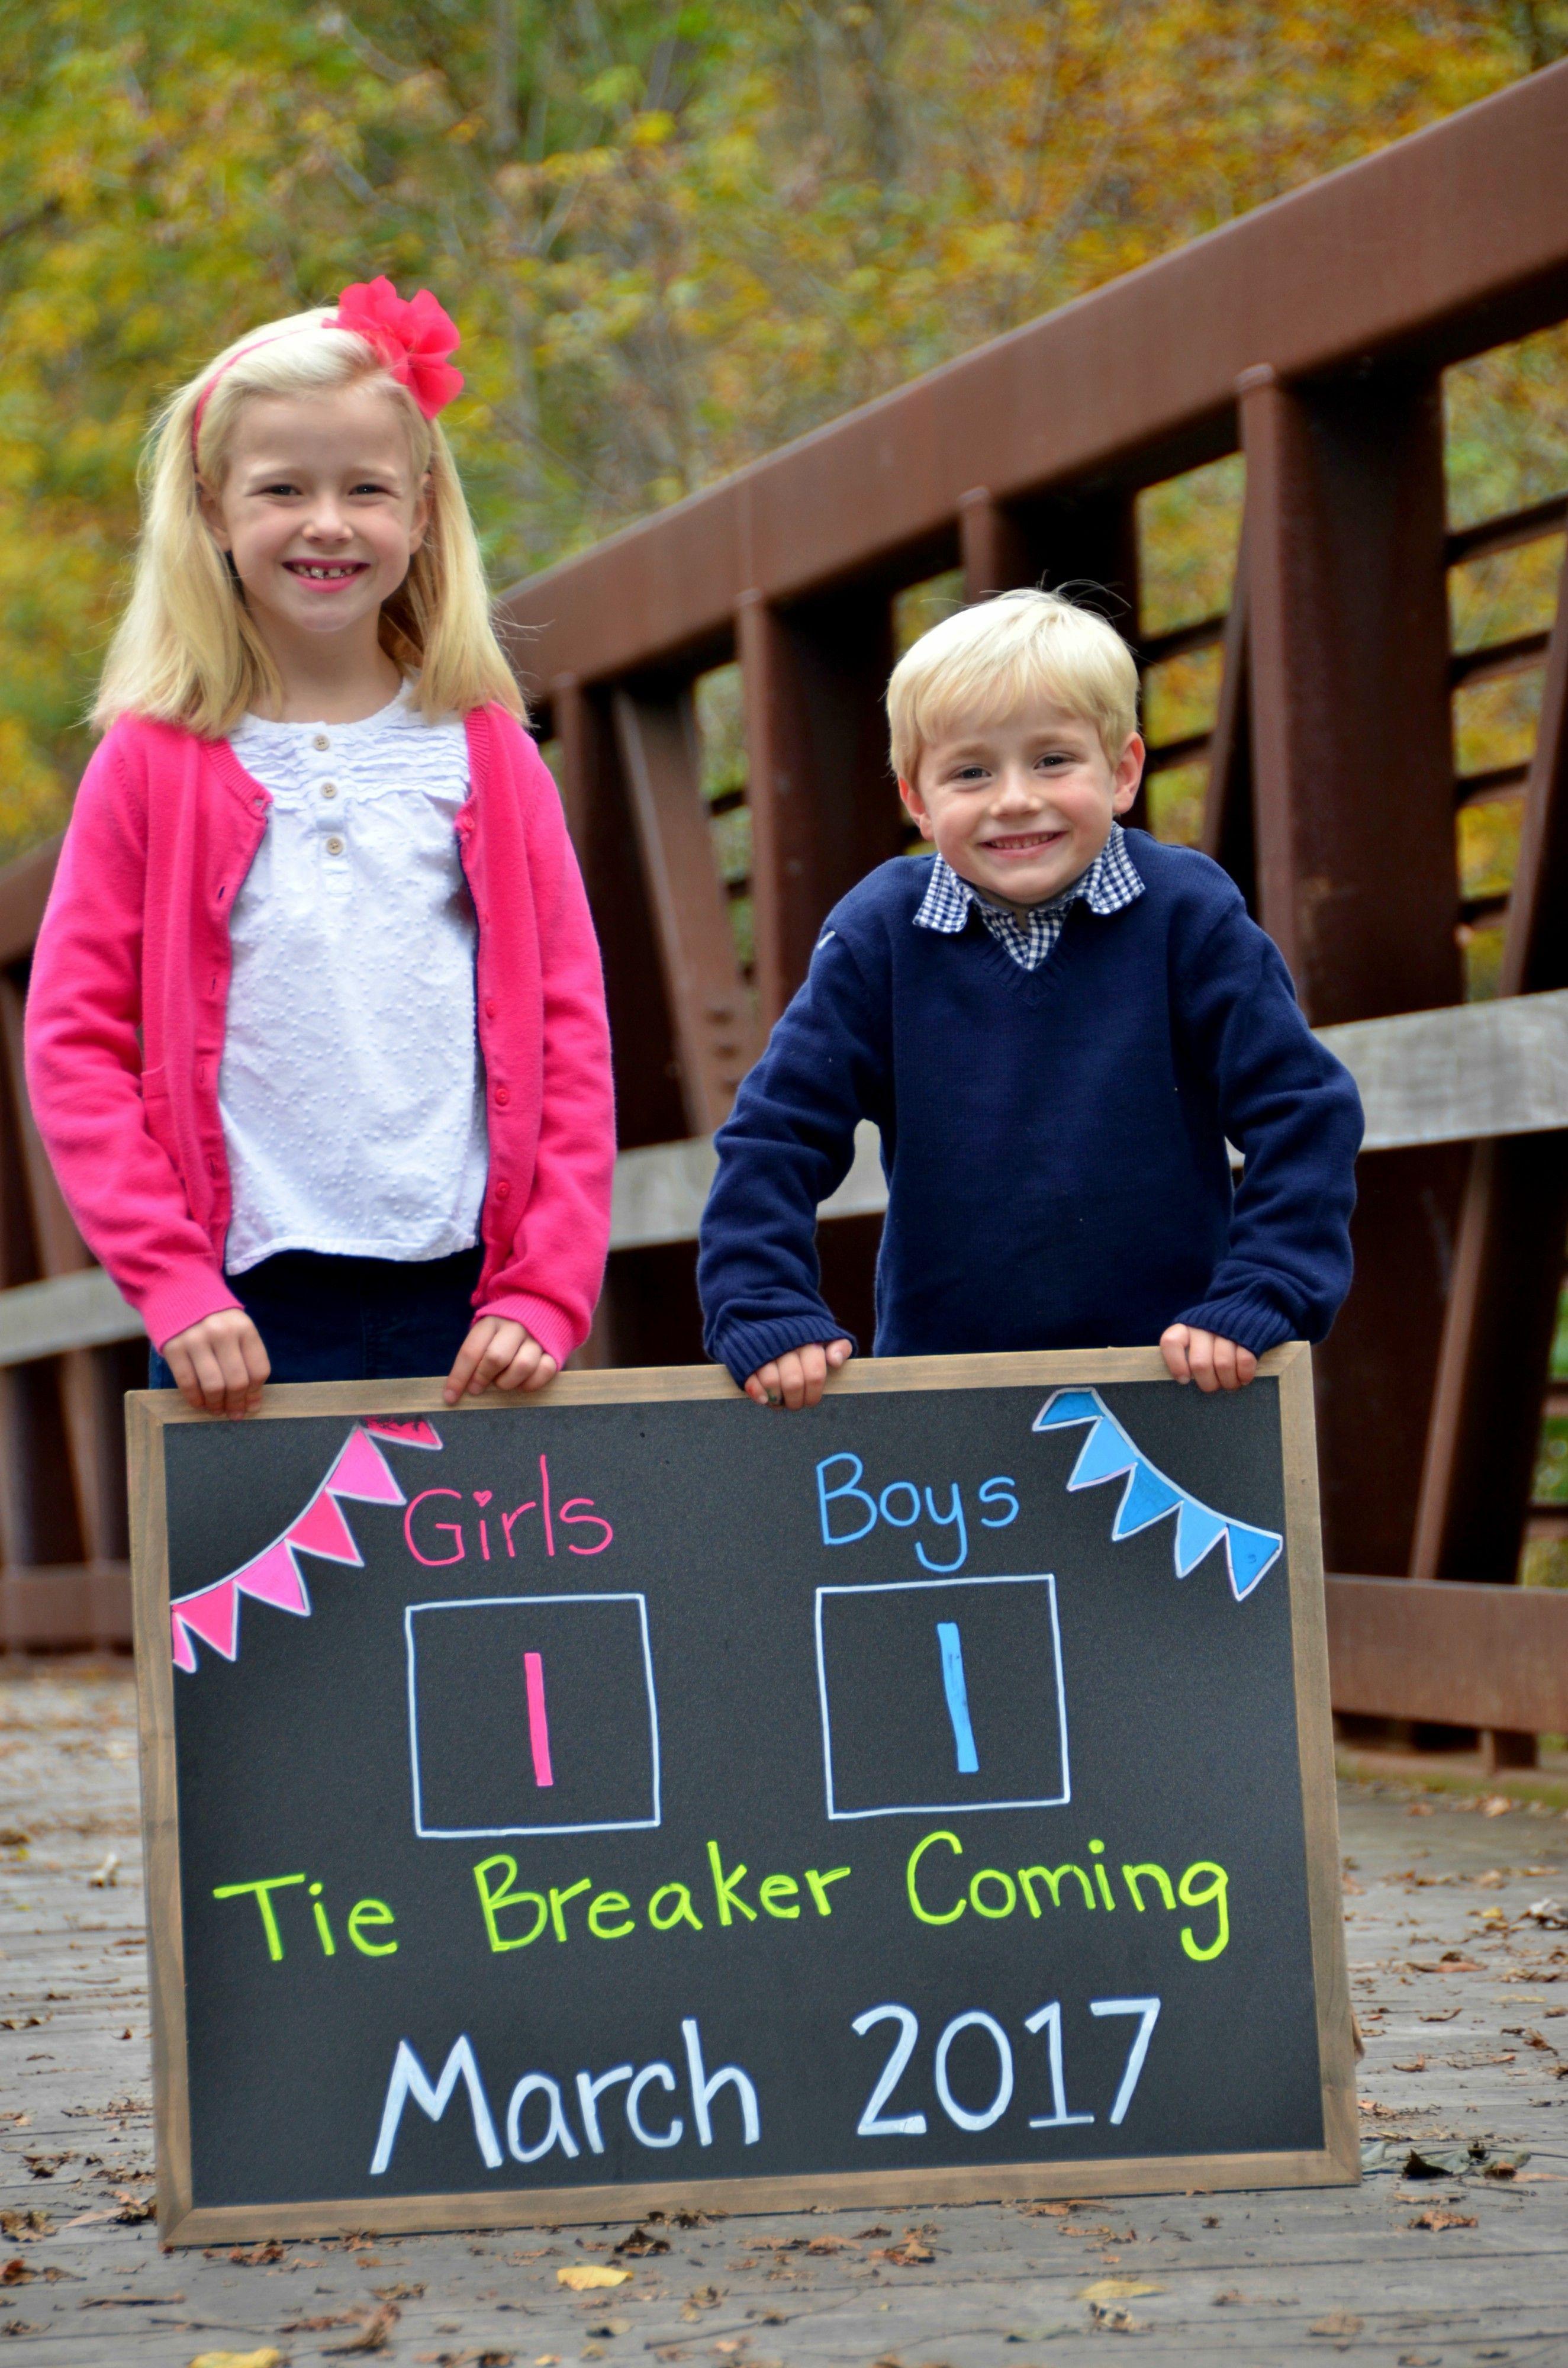 Tie breaker baby baby announcement | Baby announcement to ...